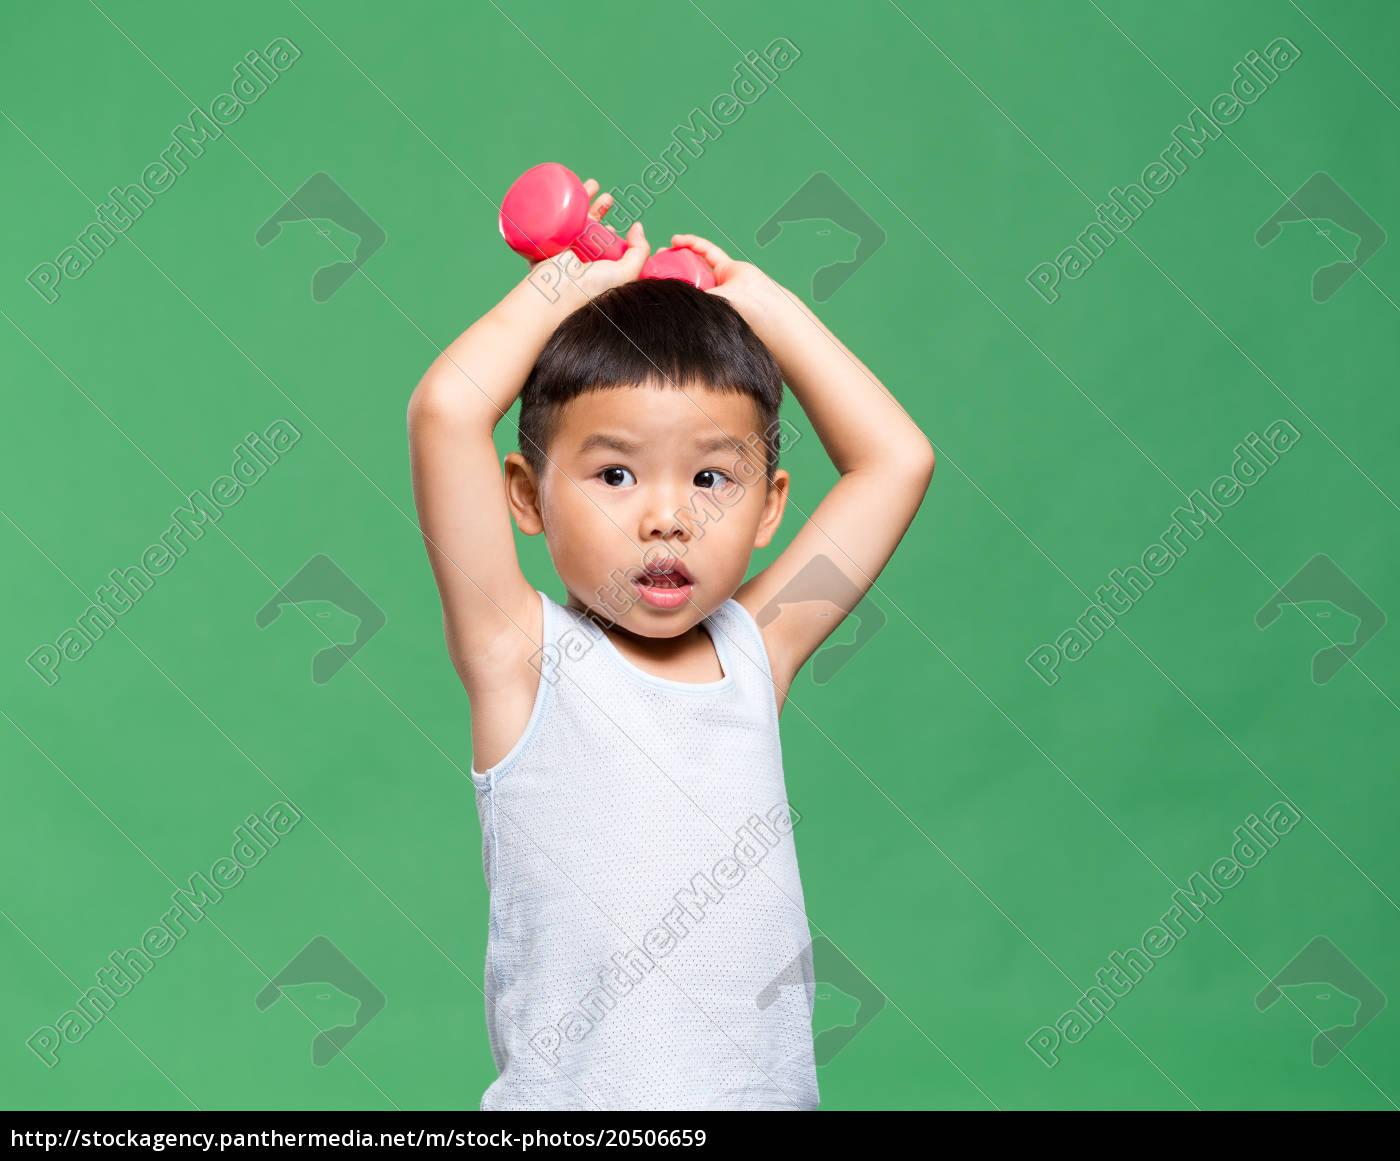 little, boy, lifting, up, dumbbell - 20506659